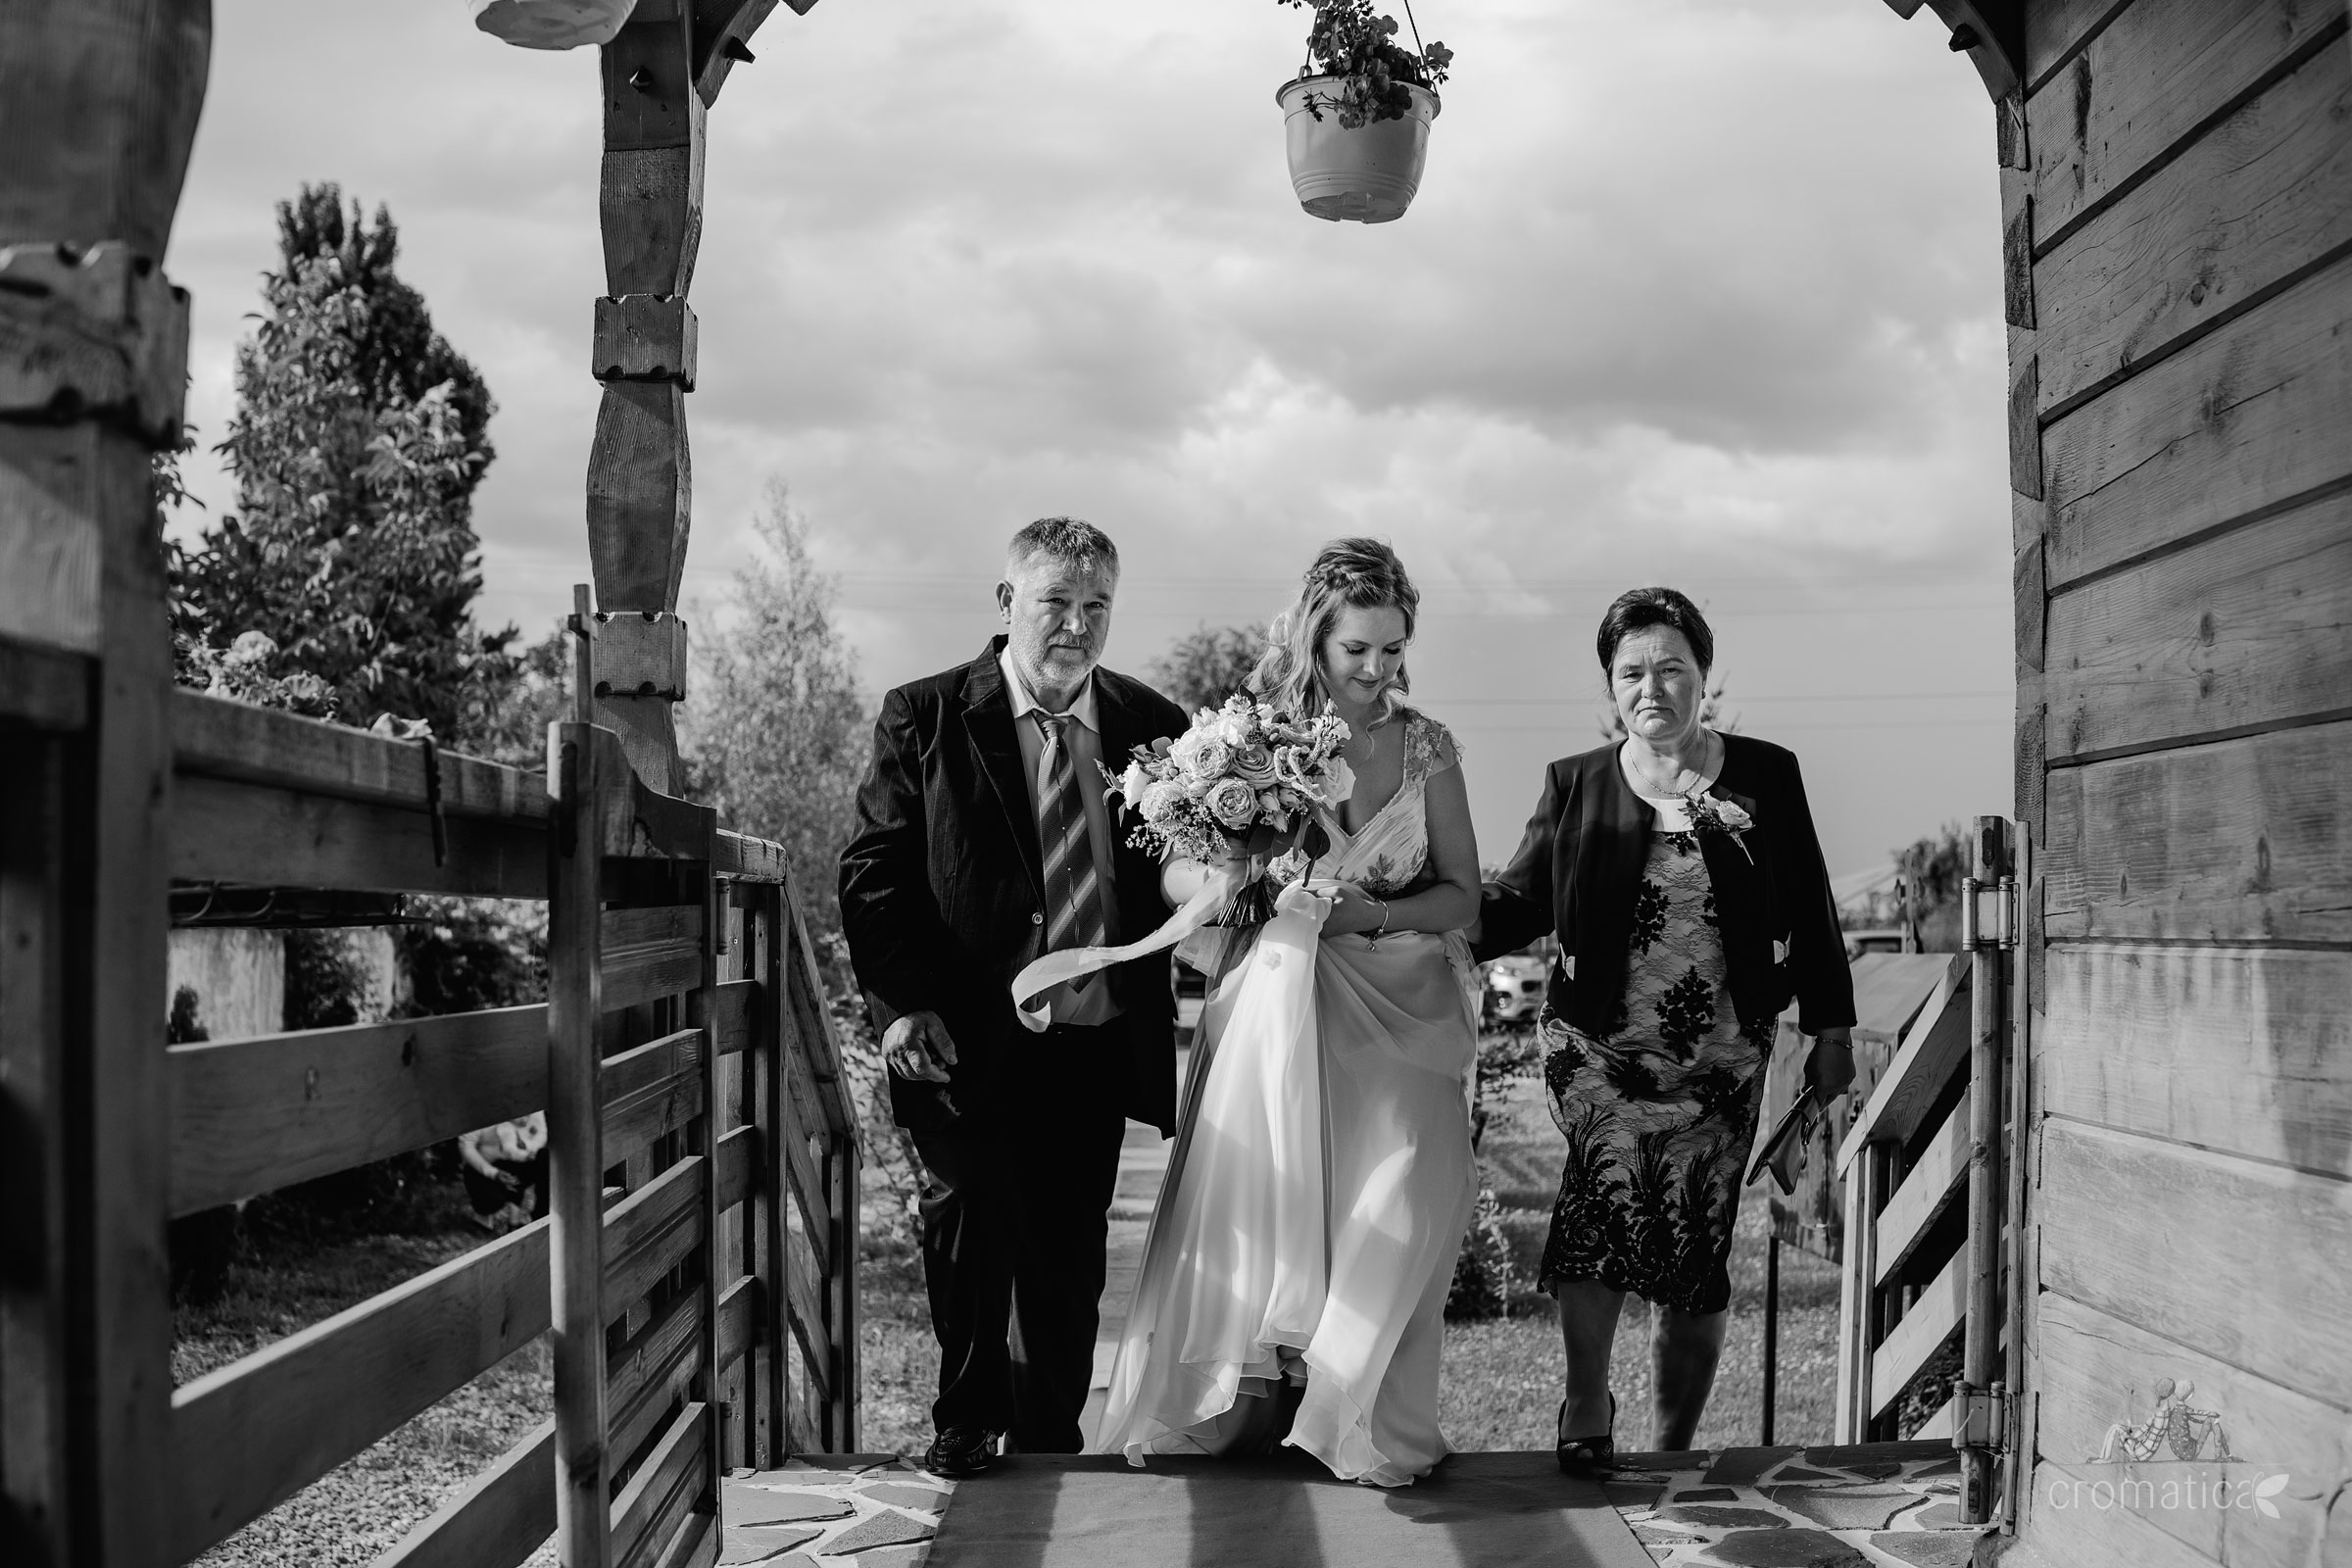 alexandra george fotografii nunta casa vlasia 049